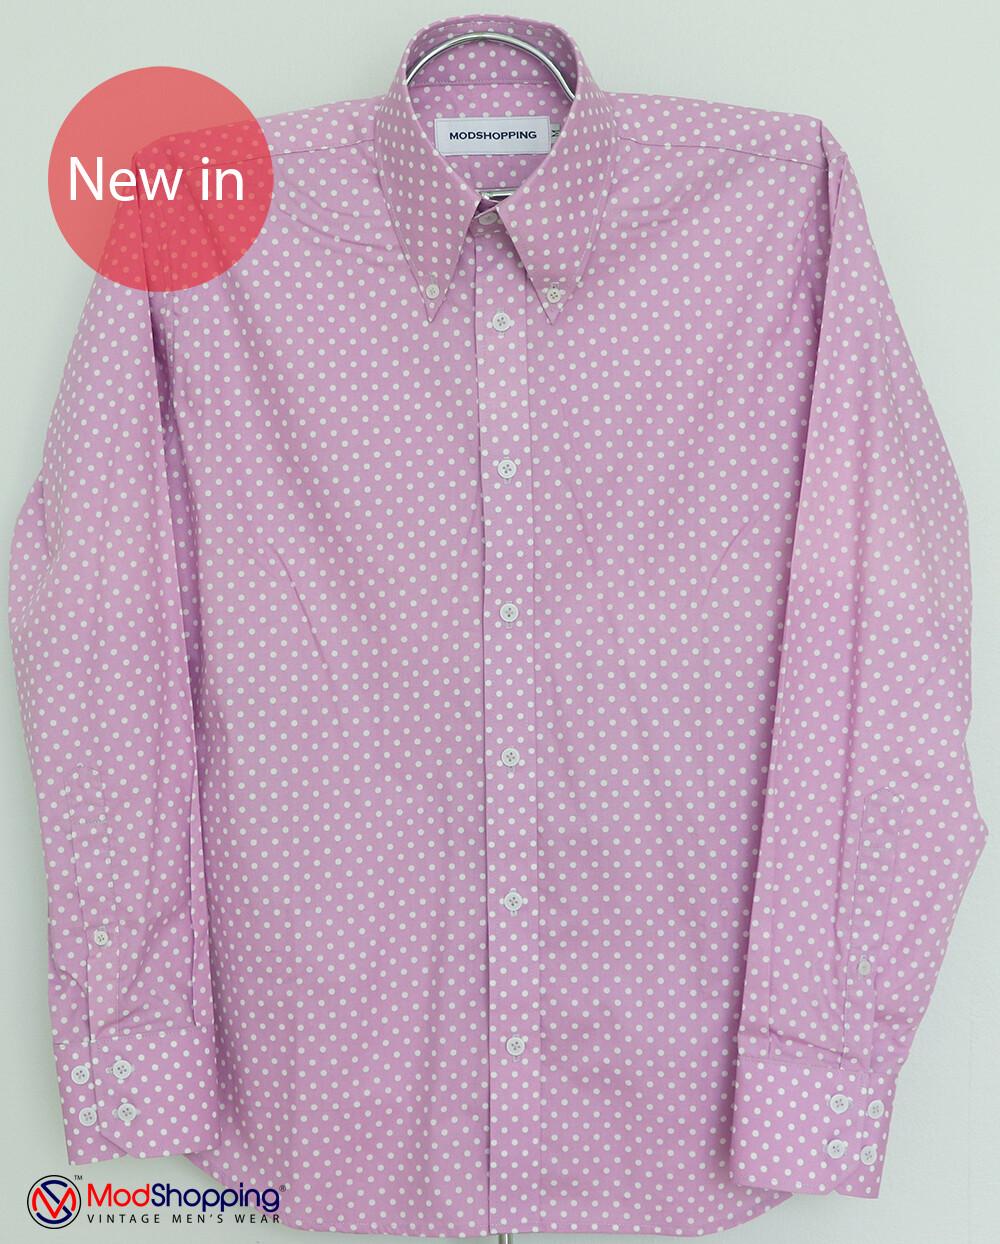 Lilac Small Polka Dot Shirt